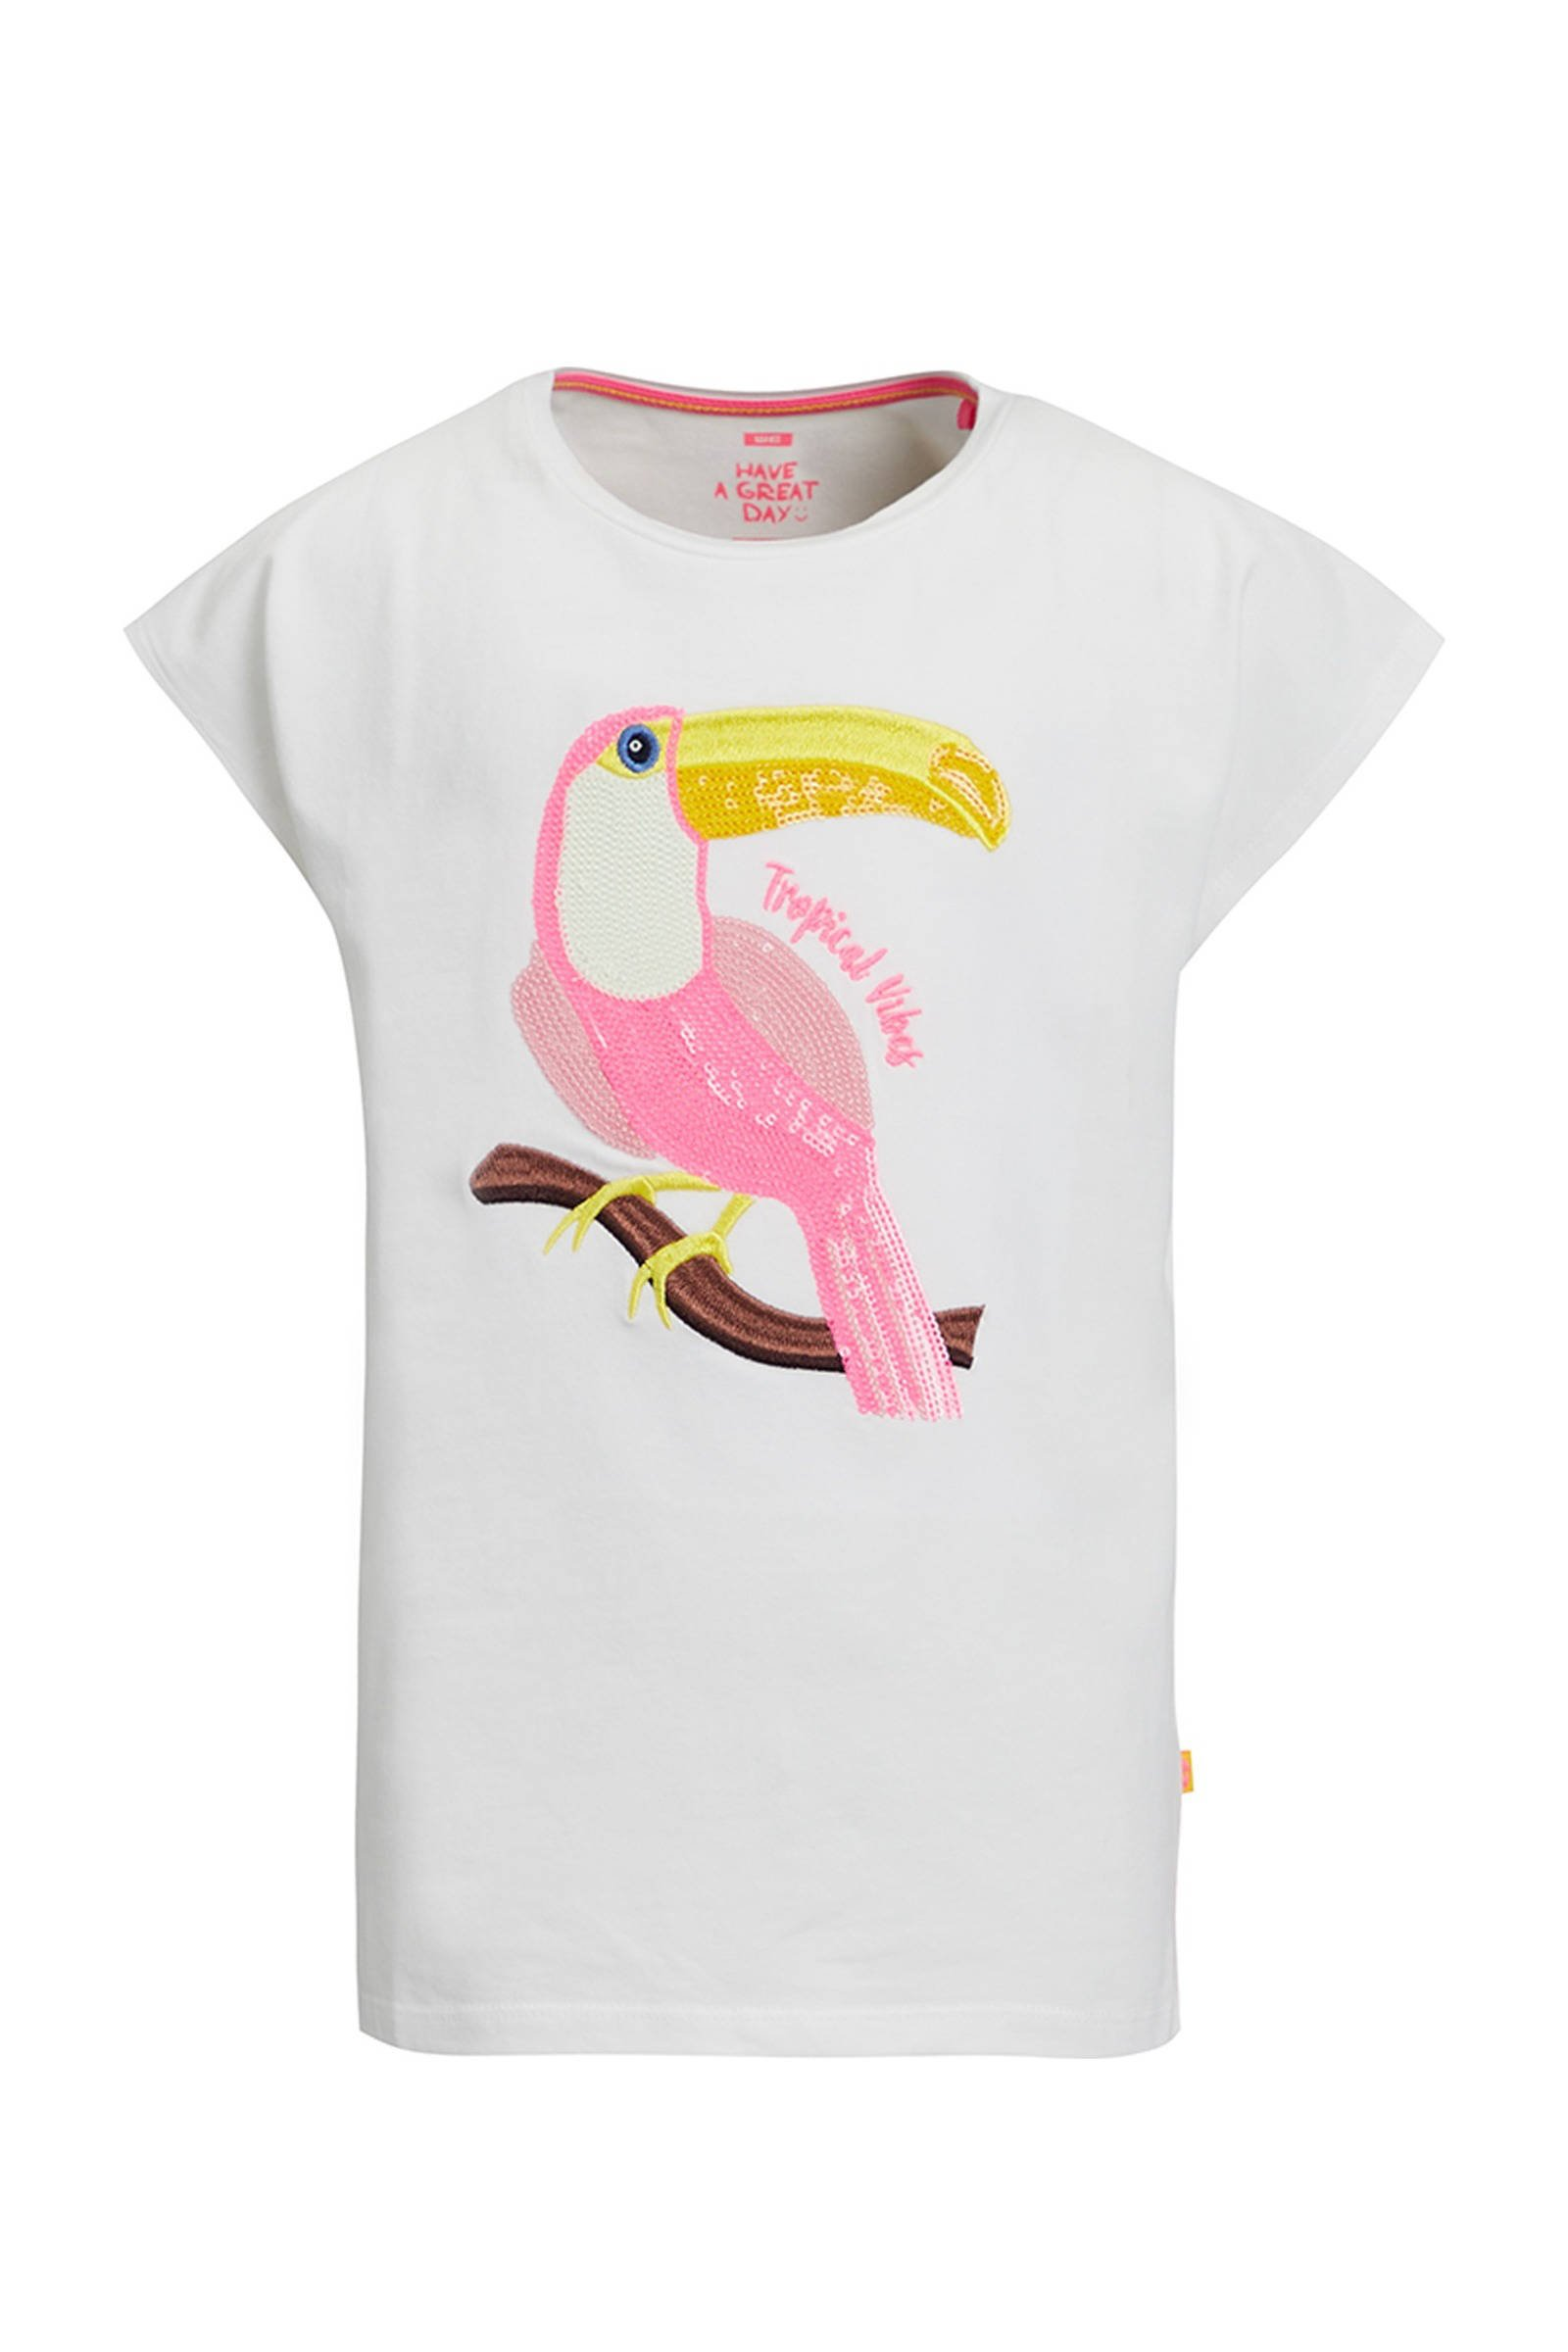 WE Fashion T-shirt met printopdruk en pailletten wit - maat 146/152